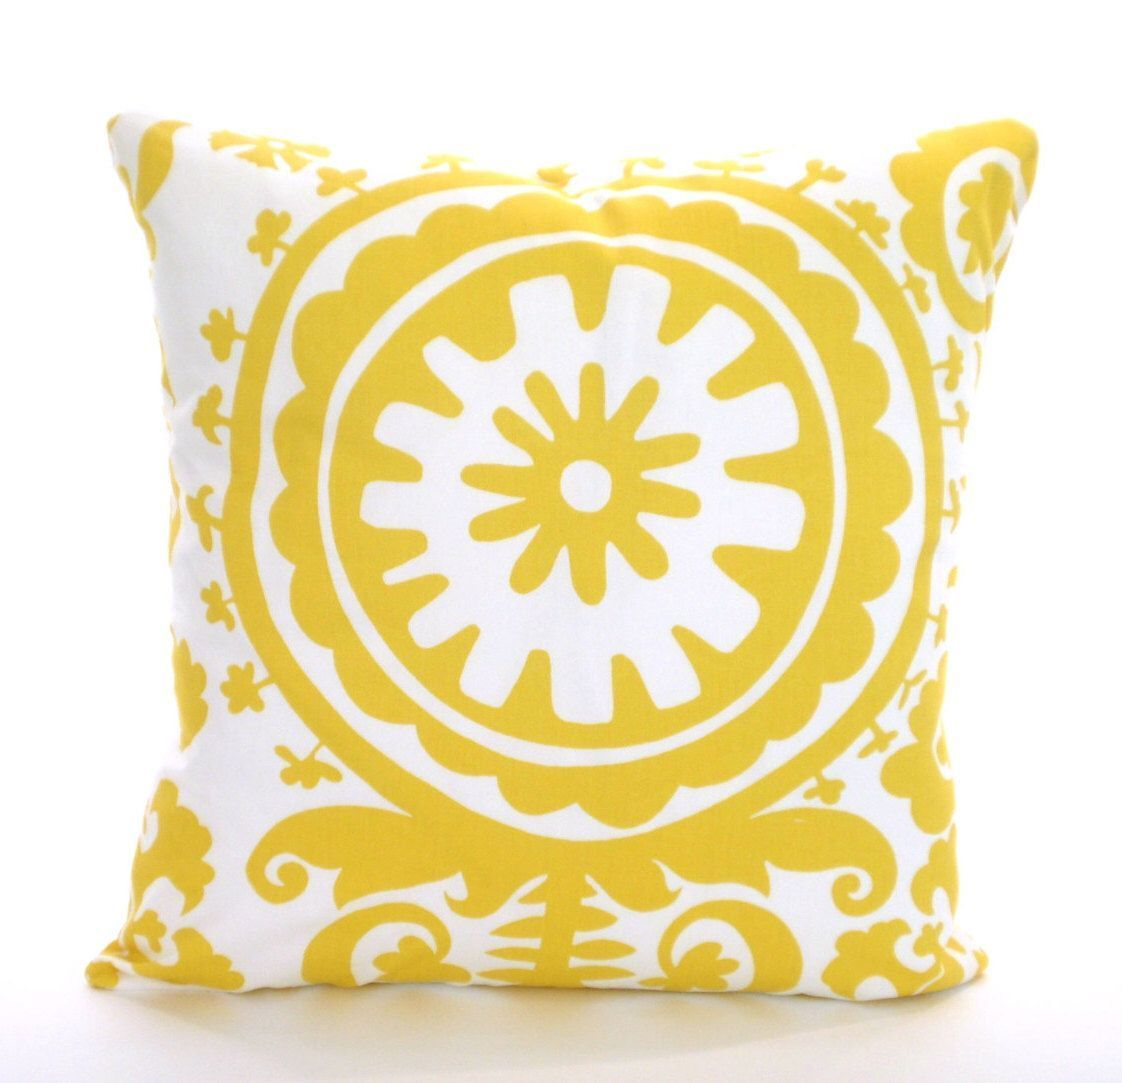 Terrific Stupefying Unique Ideas Decorative Pillows On Bed Cozy Evergreenethics Interior Chair Design Evergreenethicsorg